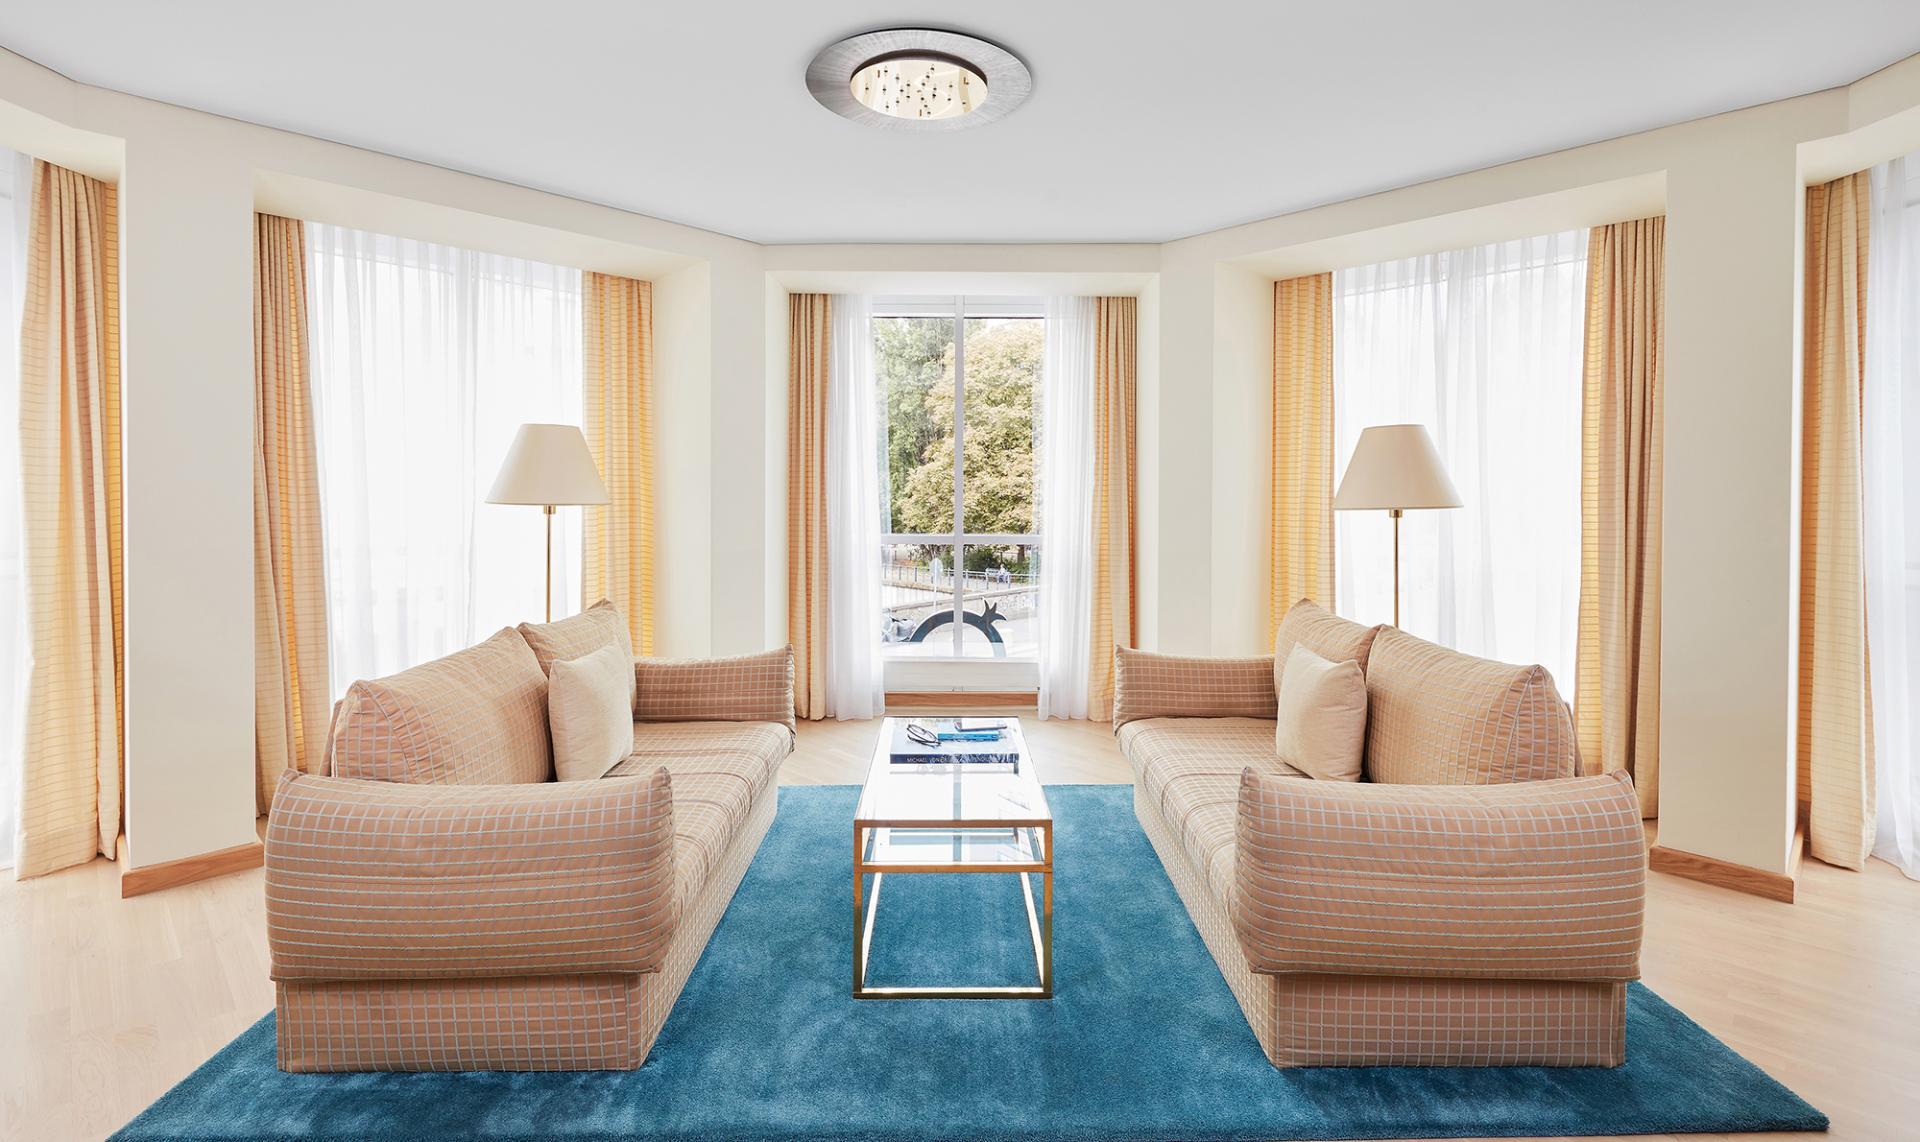 Living area at Living Hotel Grosser Kurfurst Apartments, Berlin Mitte, Berlin